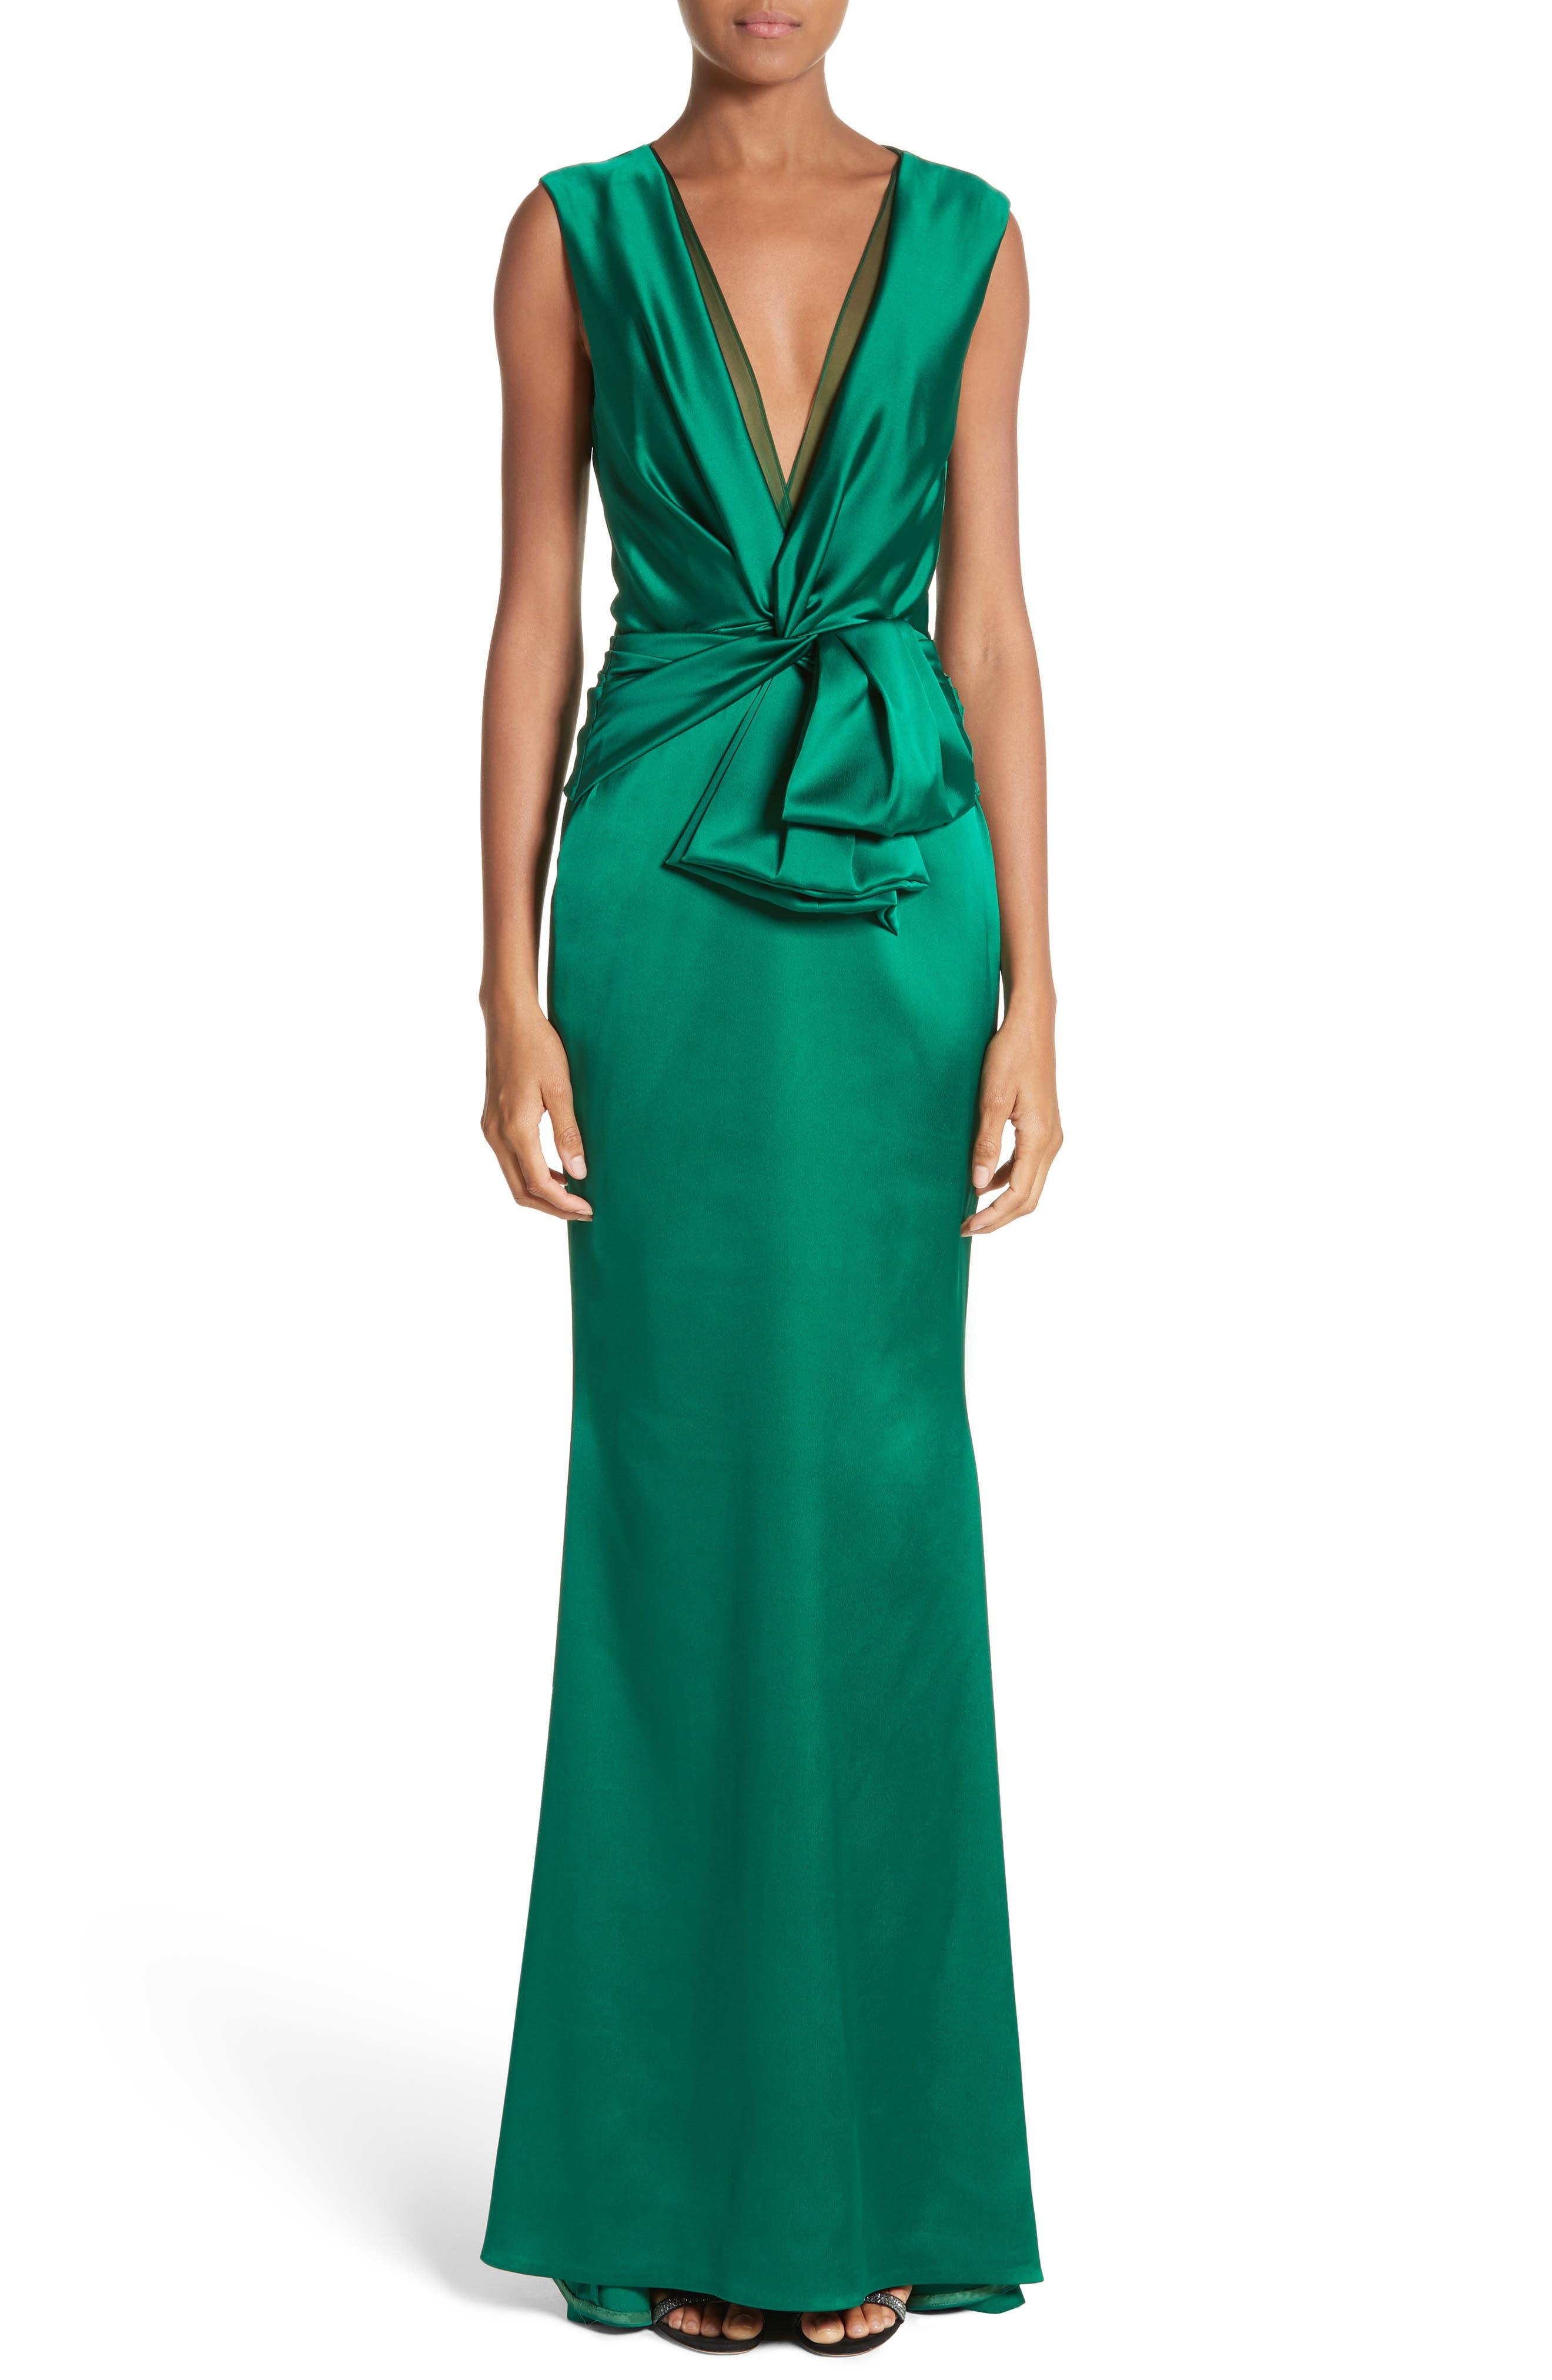 TALBOT RUNHOF Crepe Satin V-Neck Gown, Main, color, 301